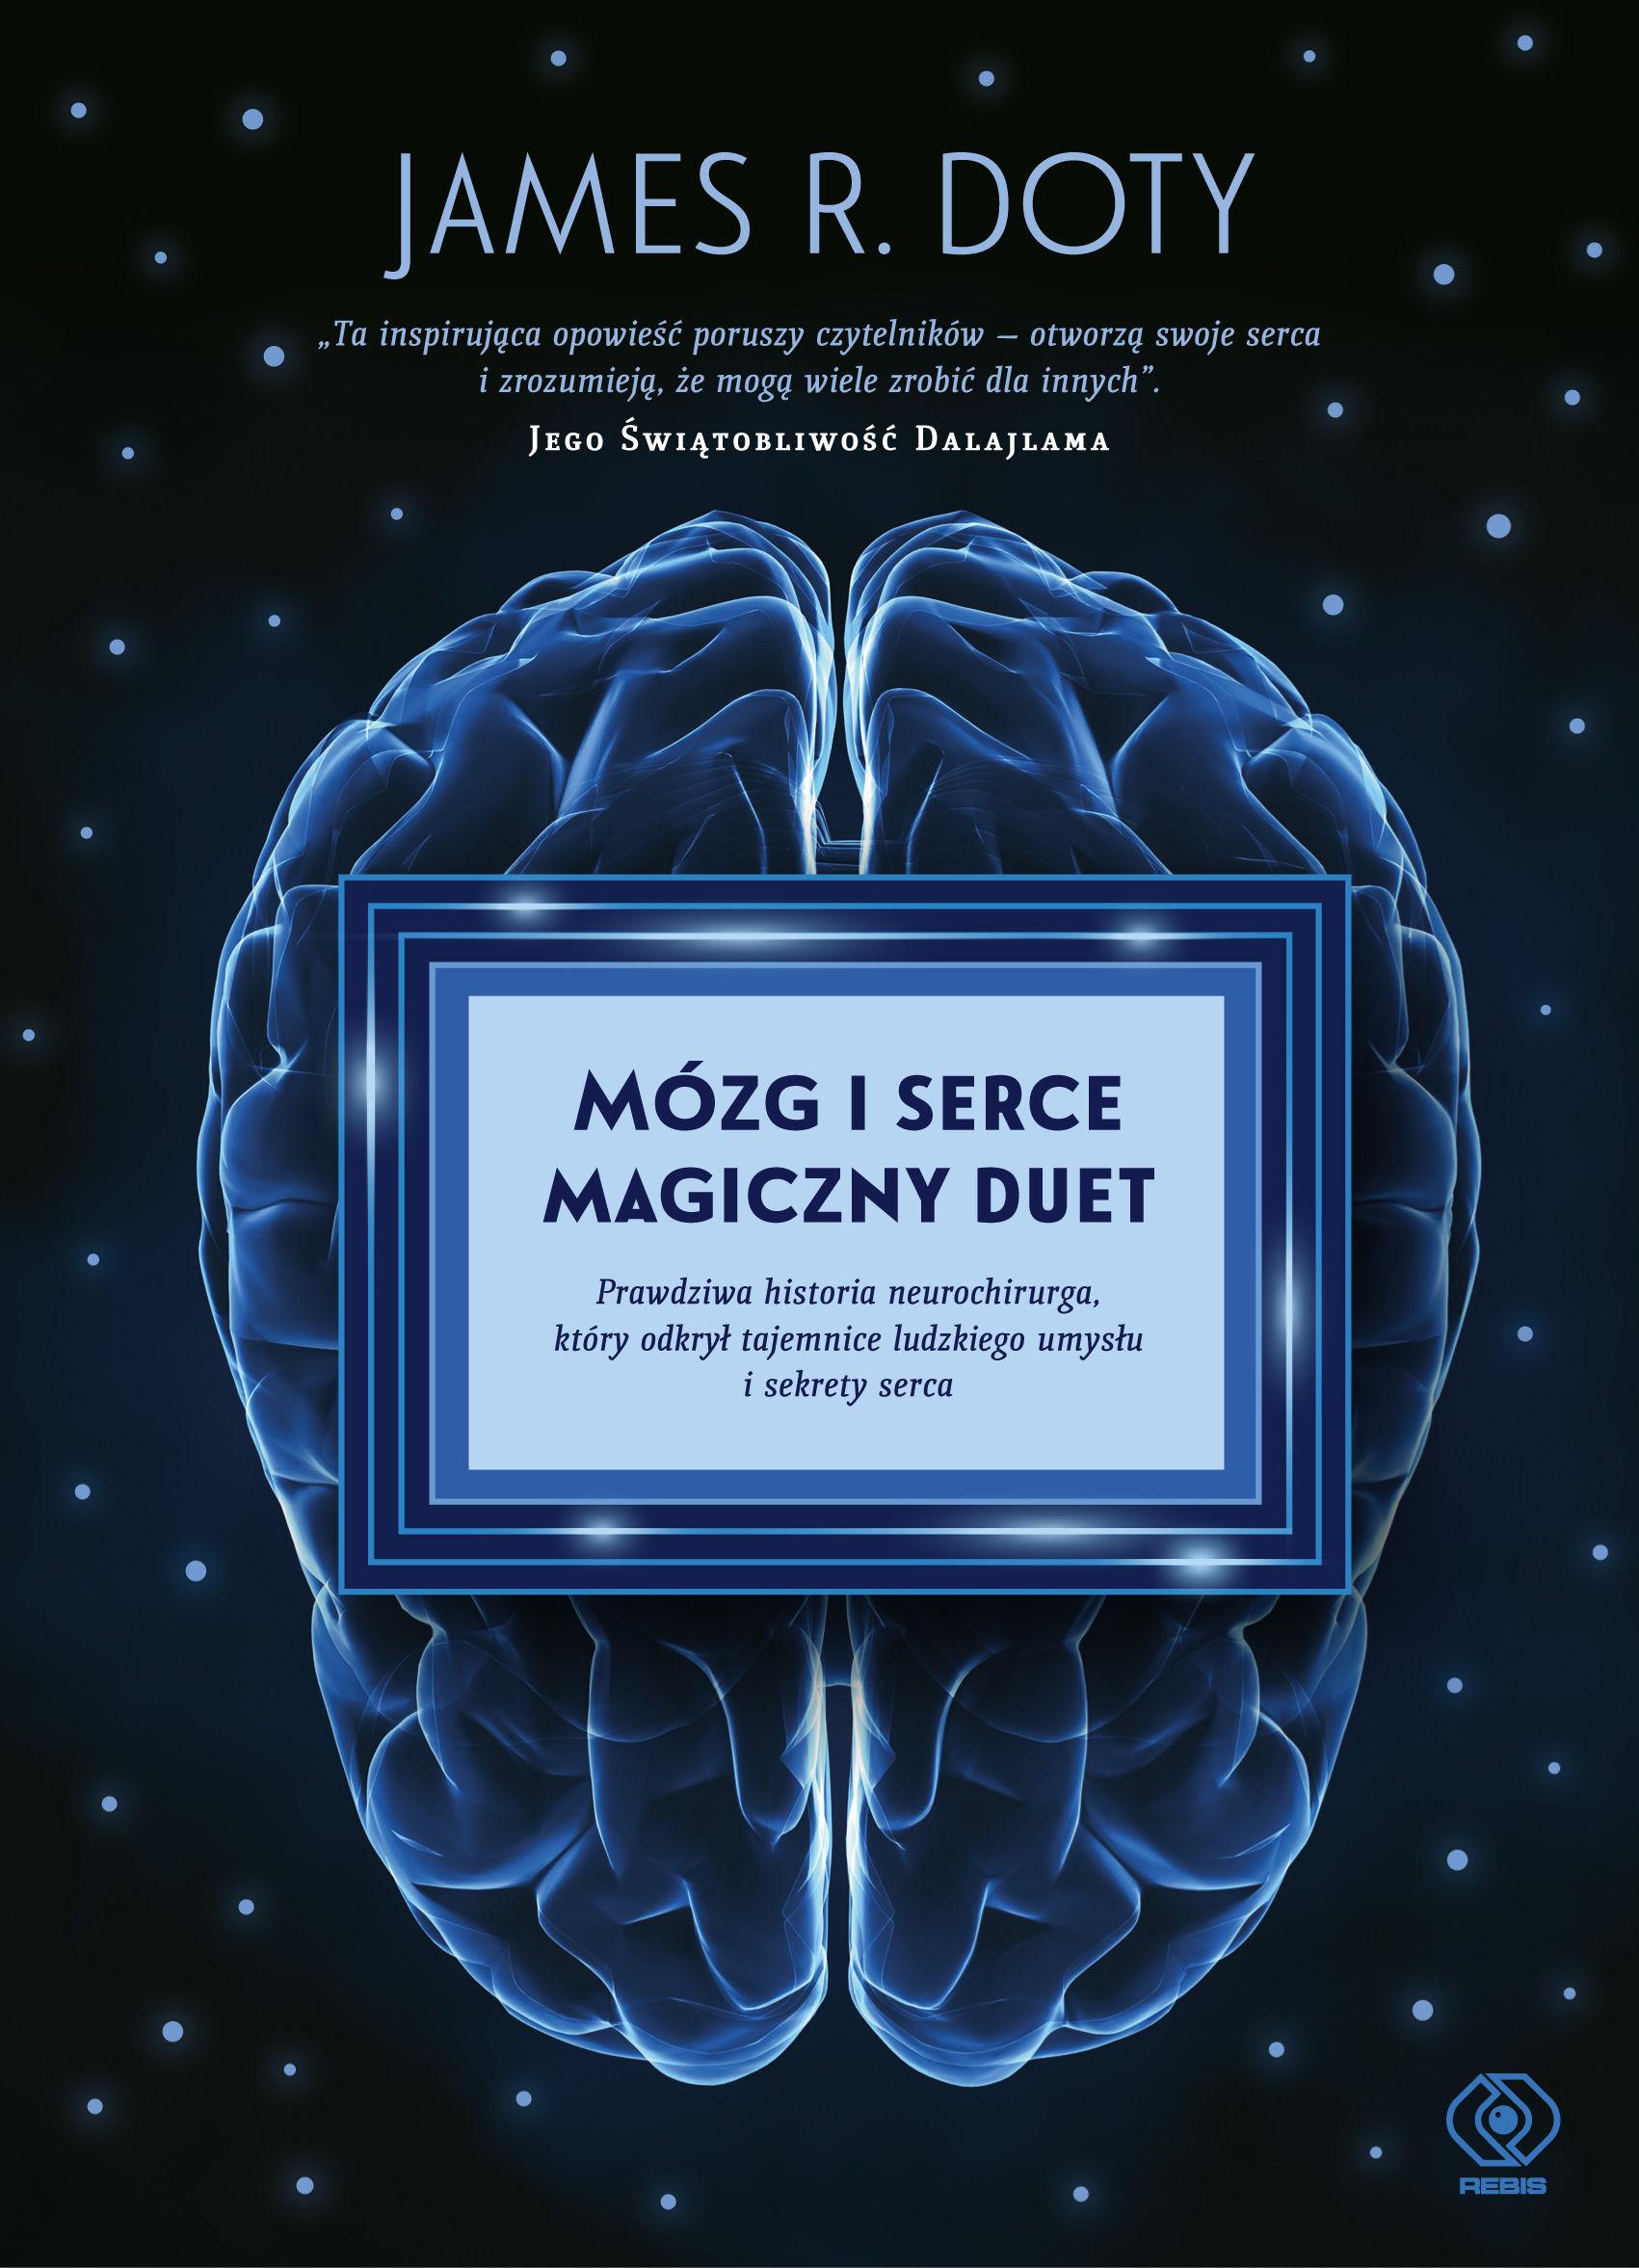 Mózg i serce  magiczny duet - James R. Doty - ebook